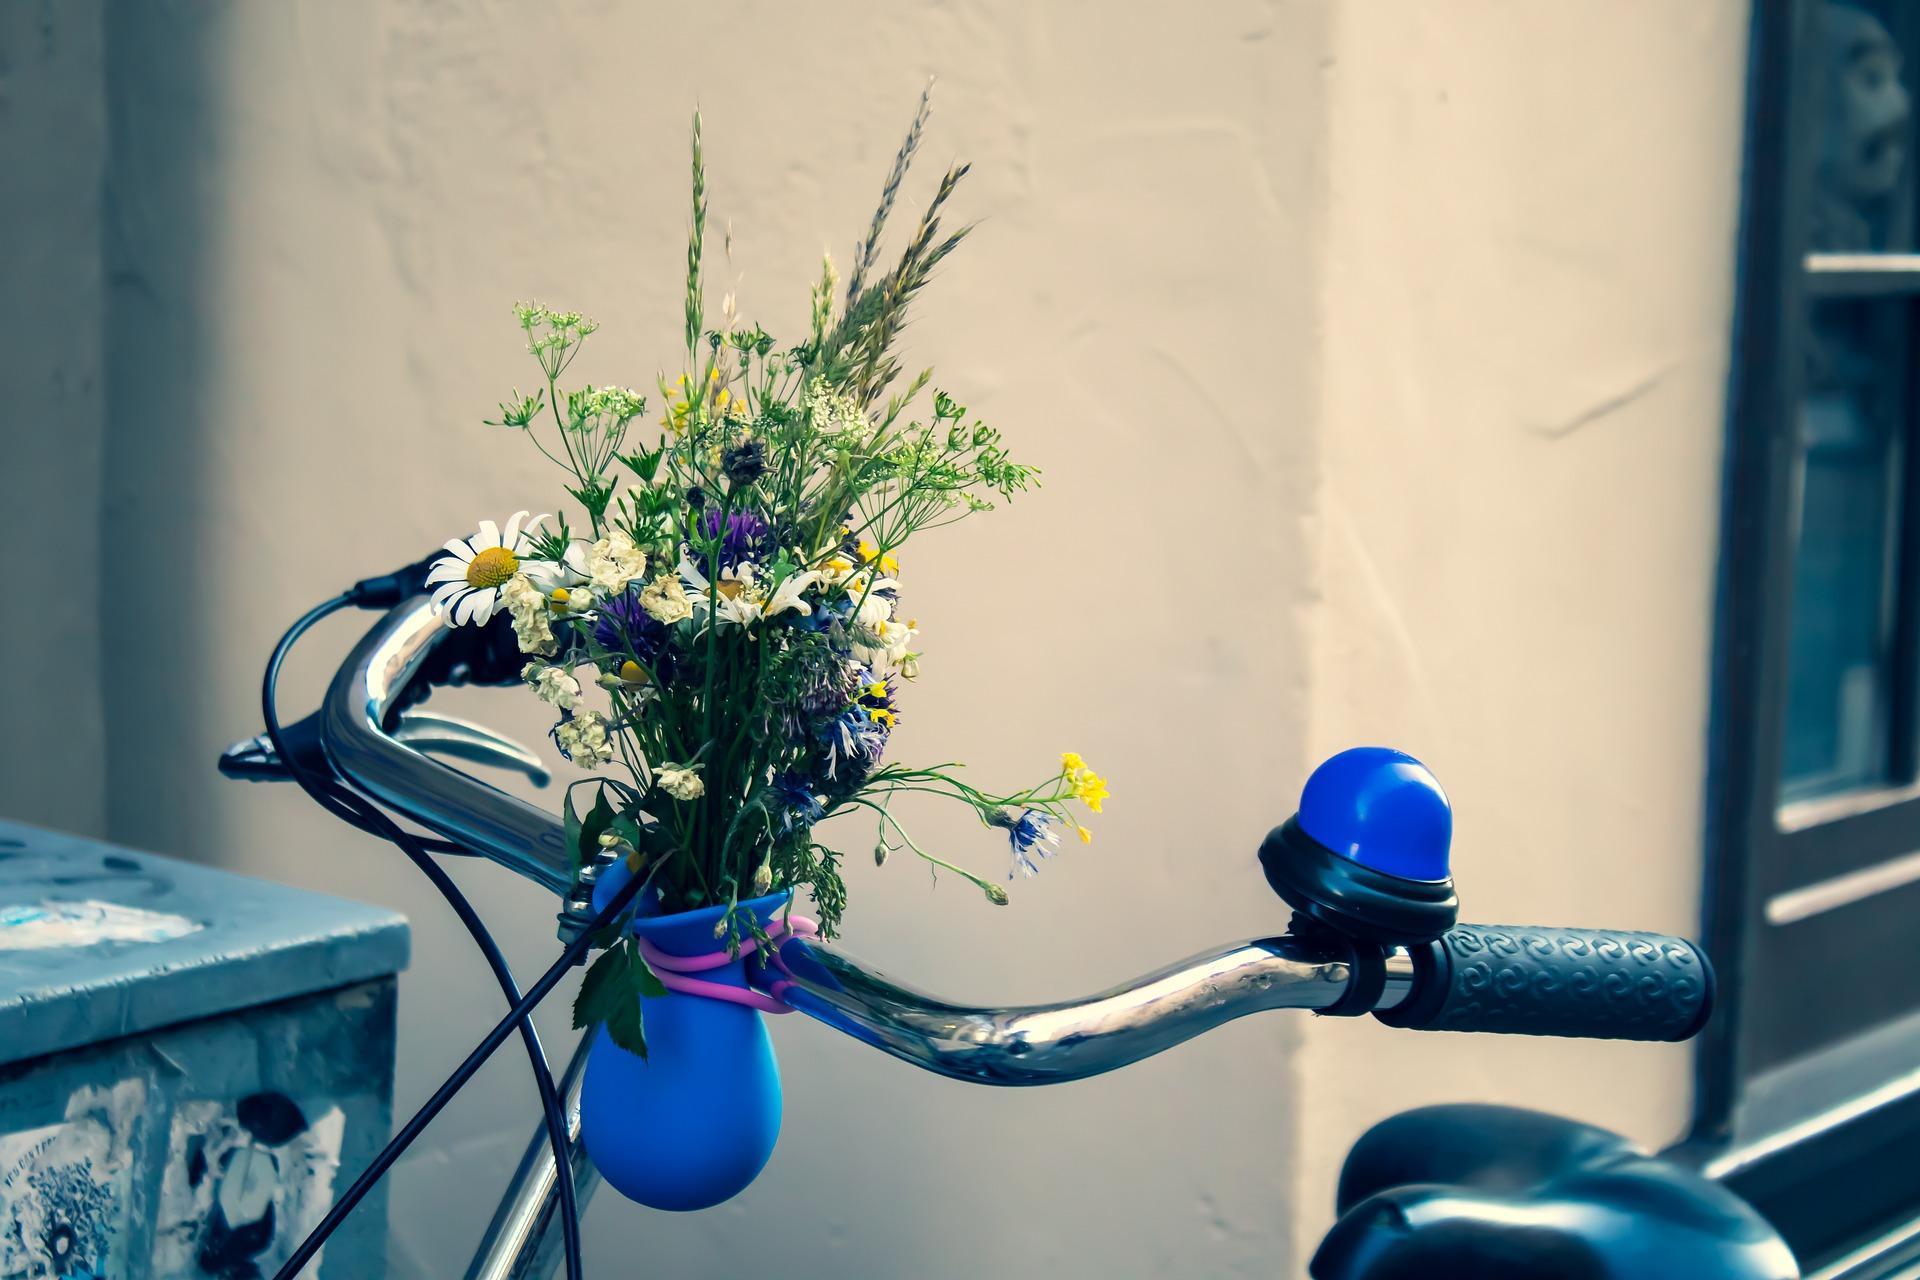 todi in e-bike - umbria - bike